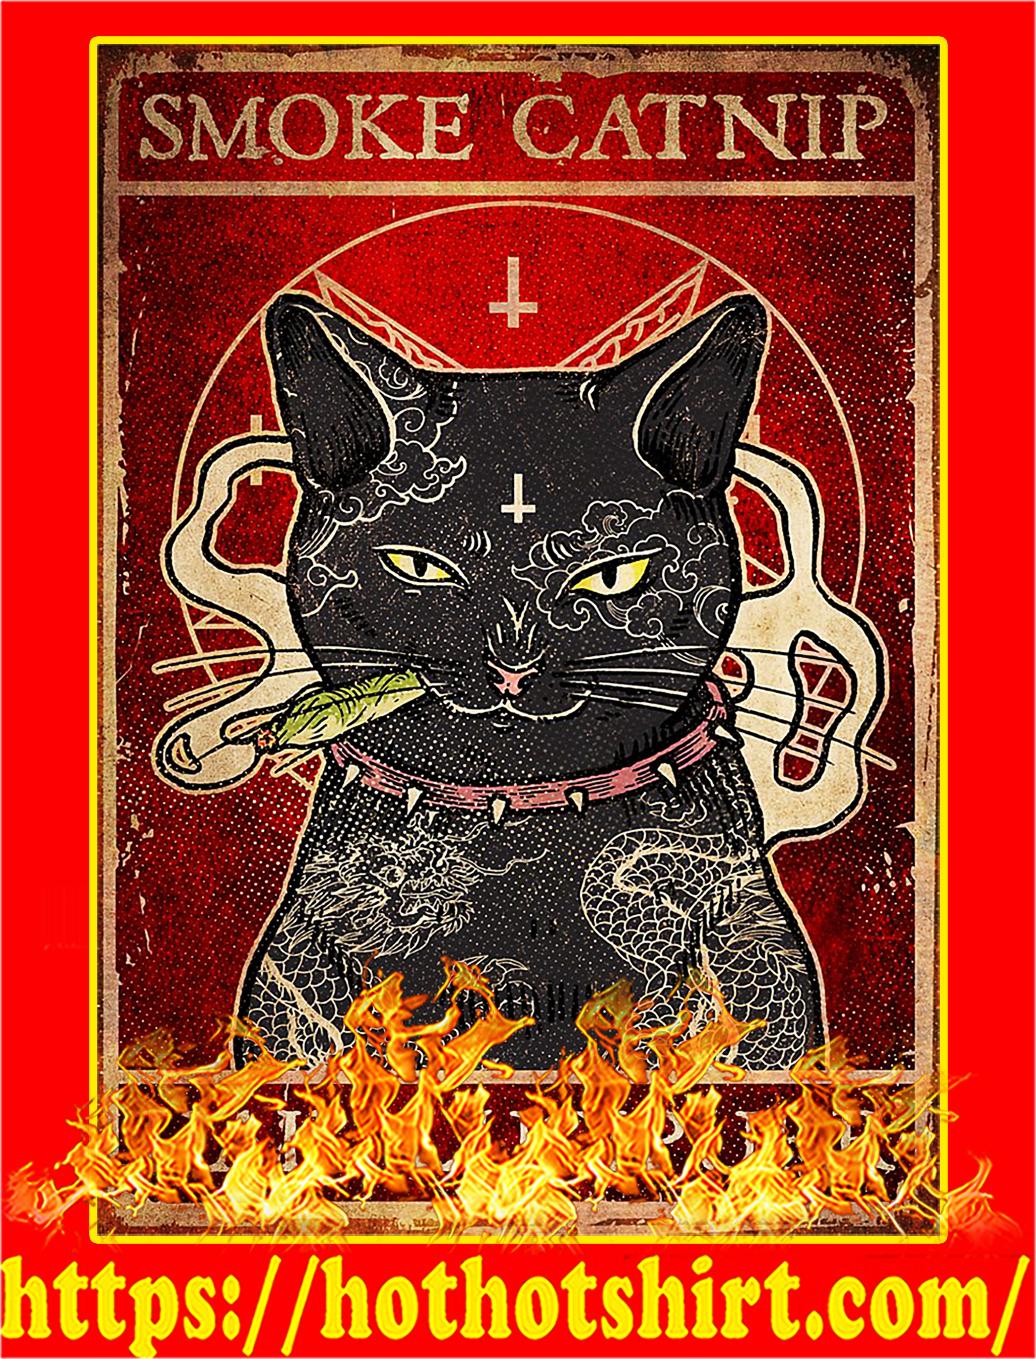 Smoke catnip hail lucipurr poster - A2